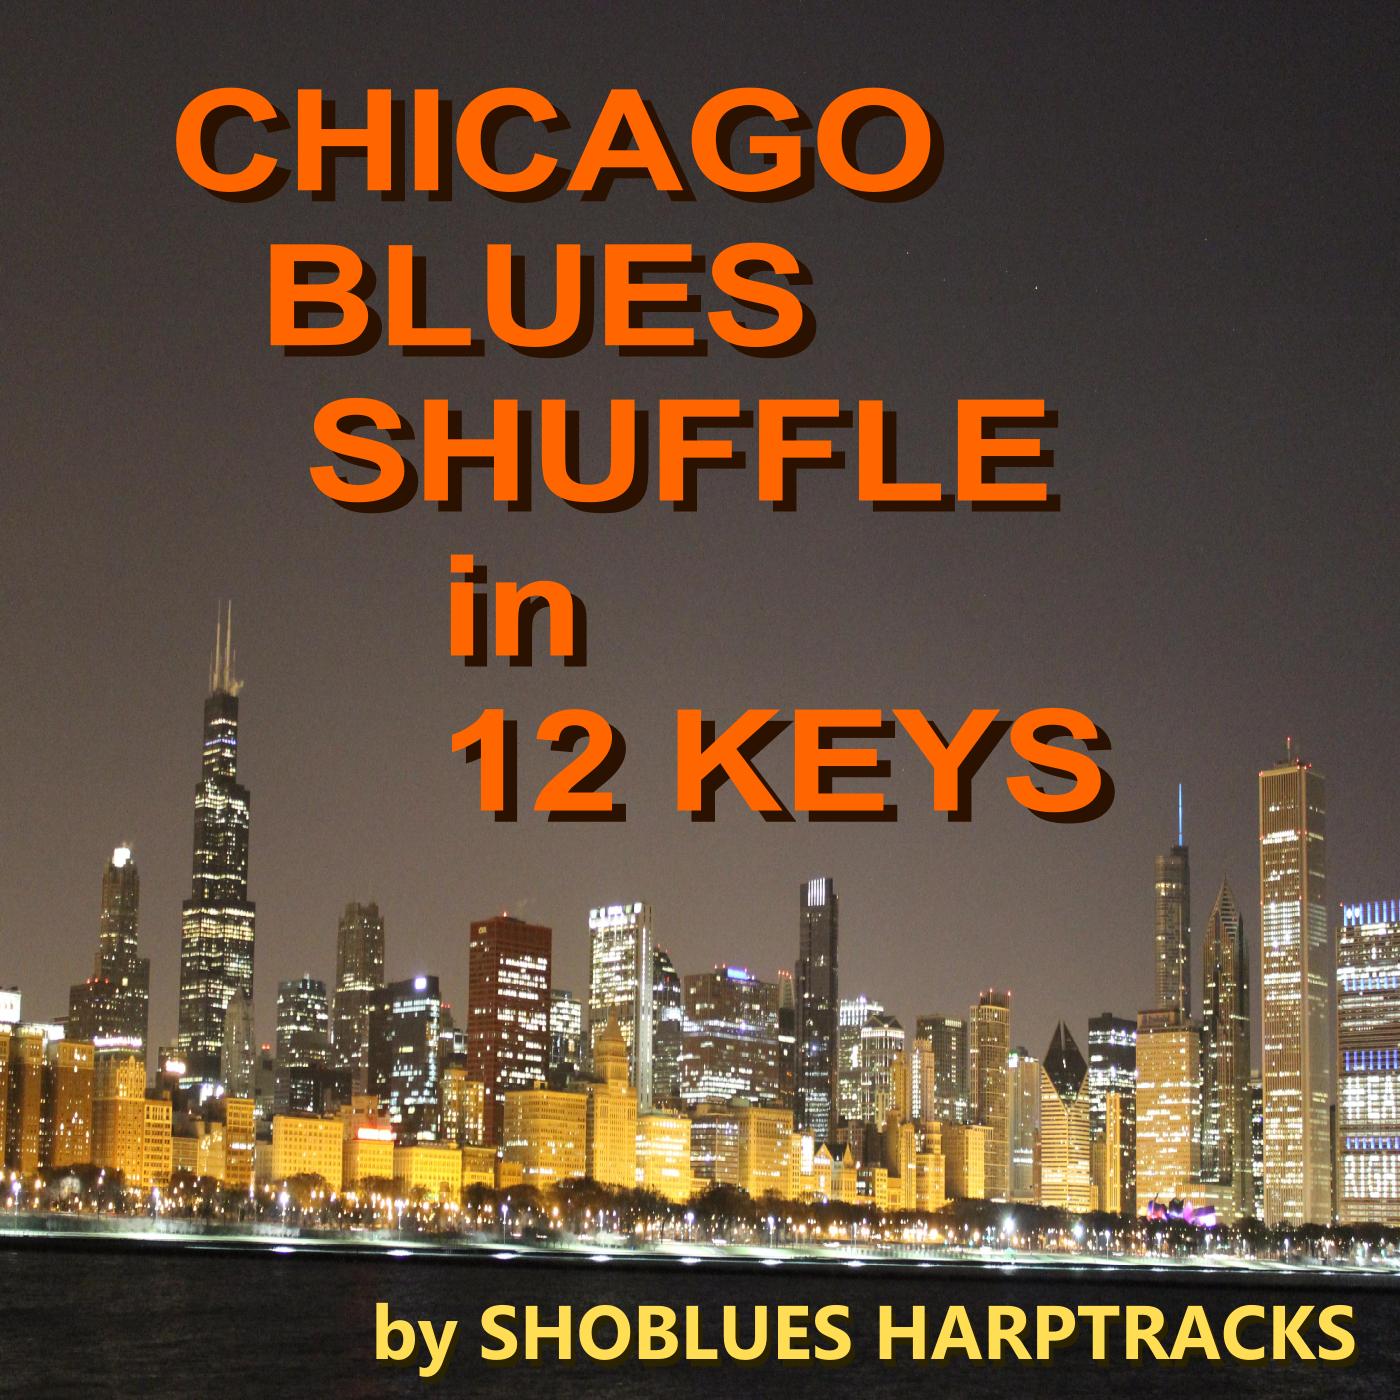 Chicago Blues Shuffle in 12 Keys / Shoblues Harptracks